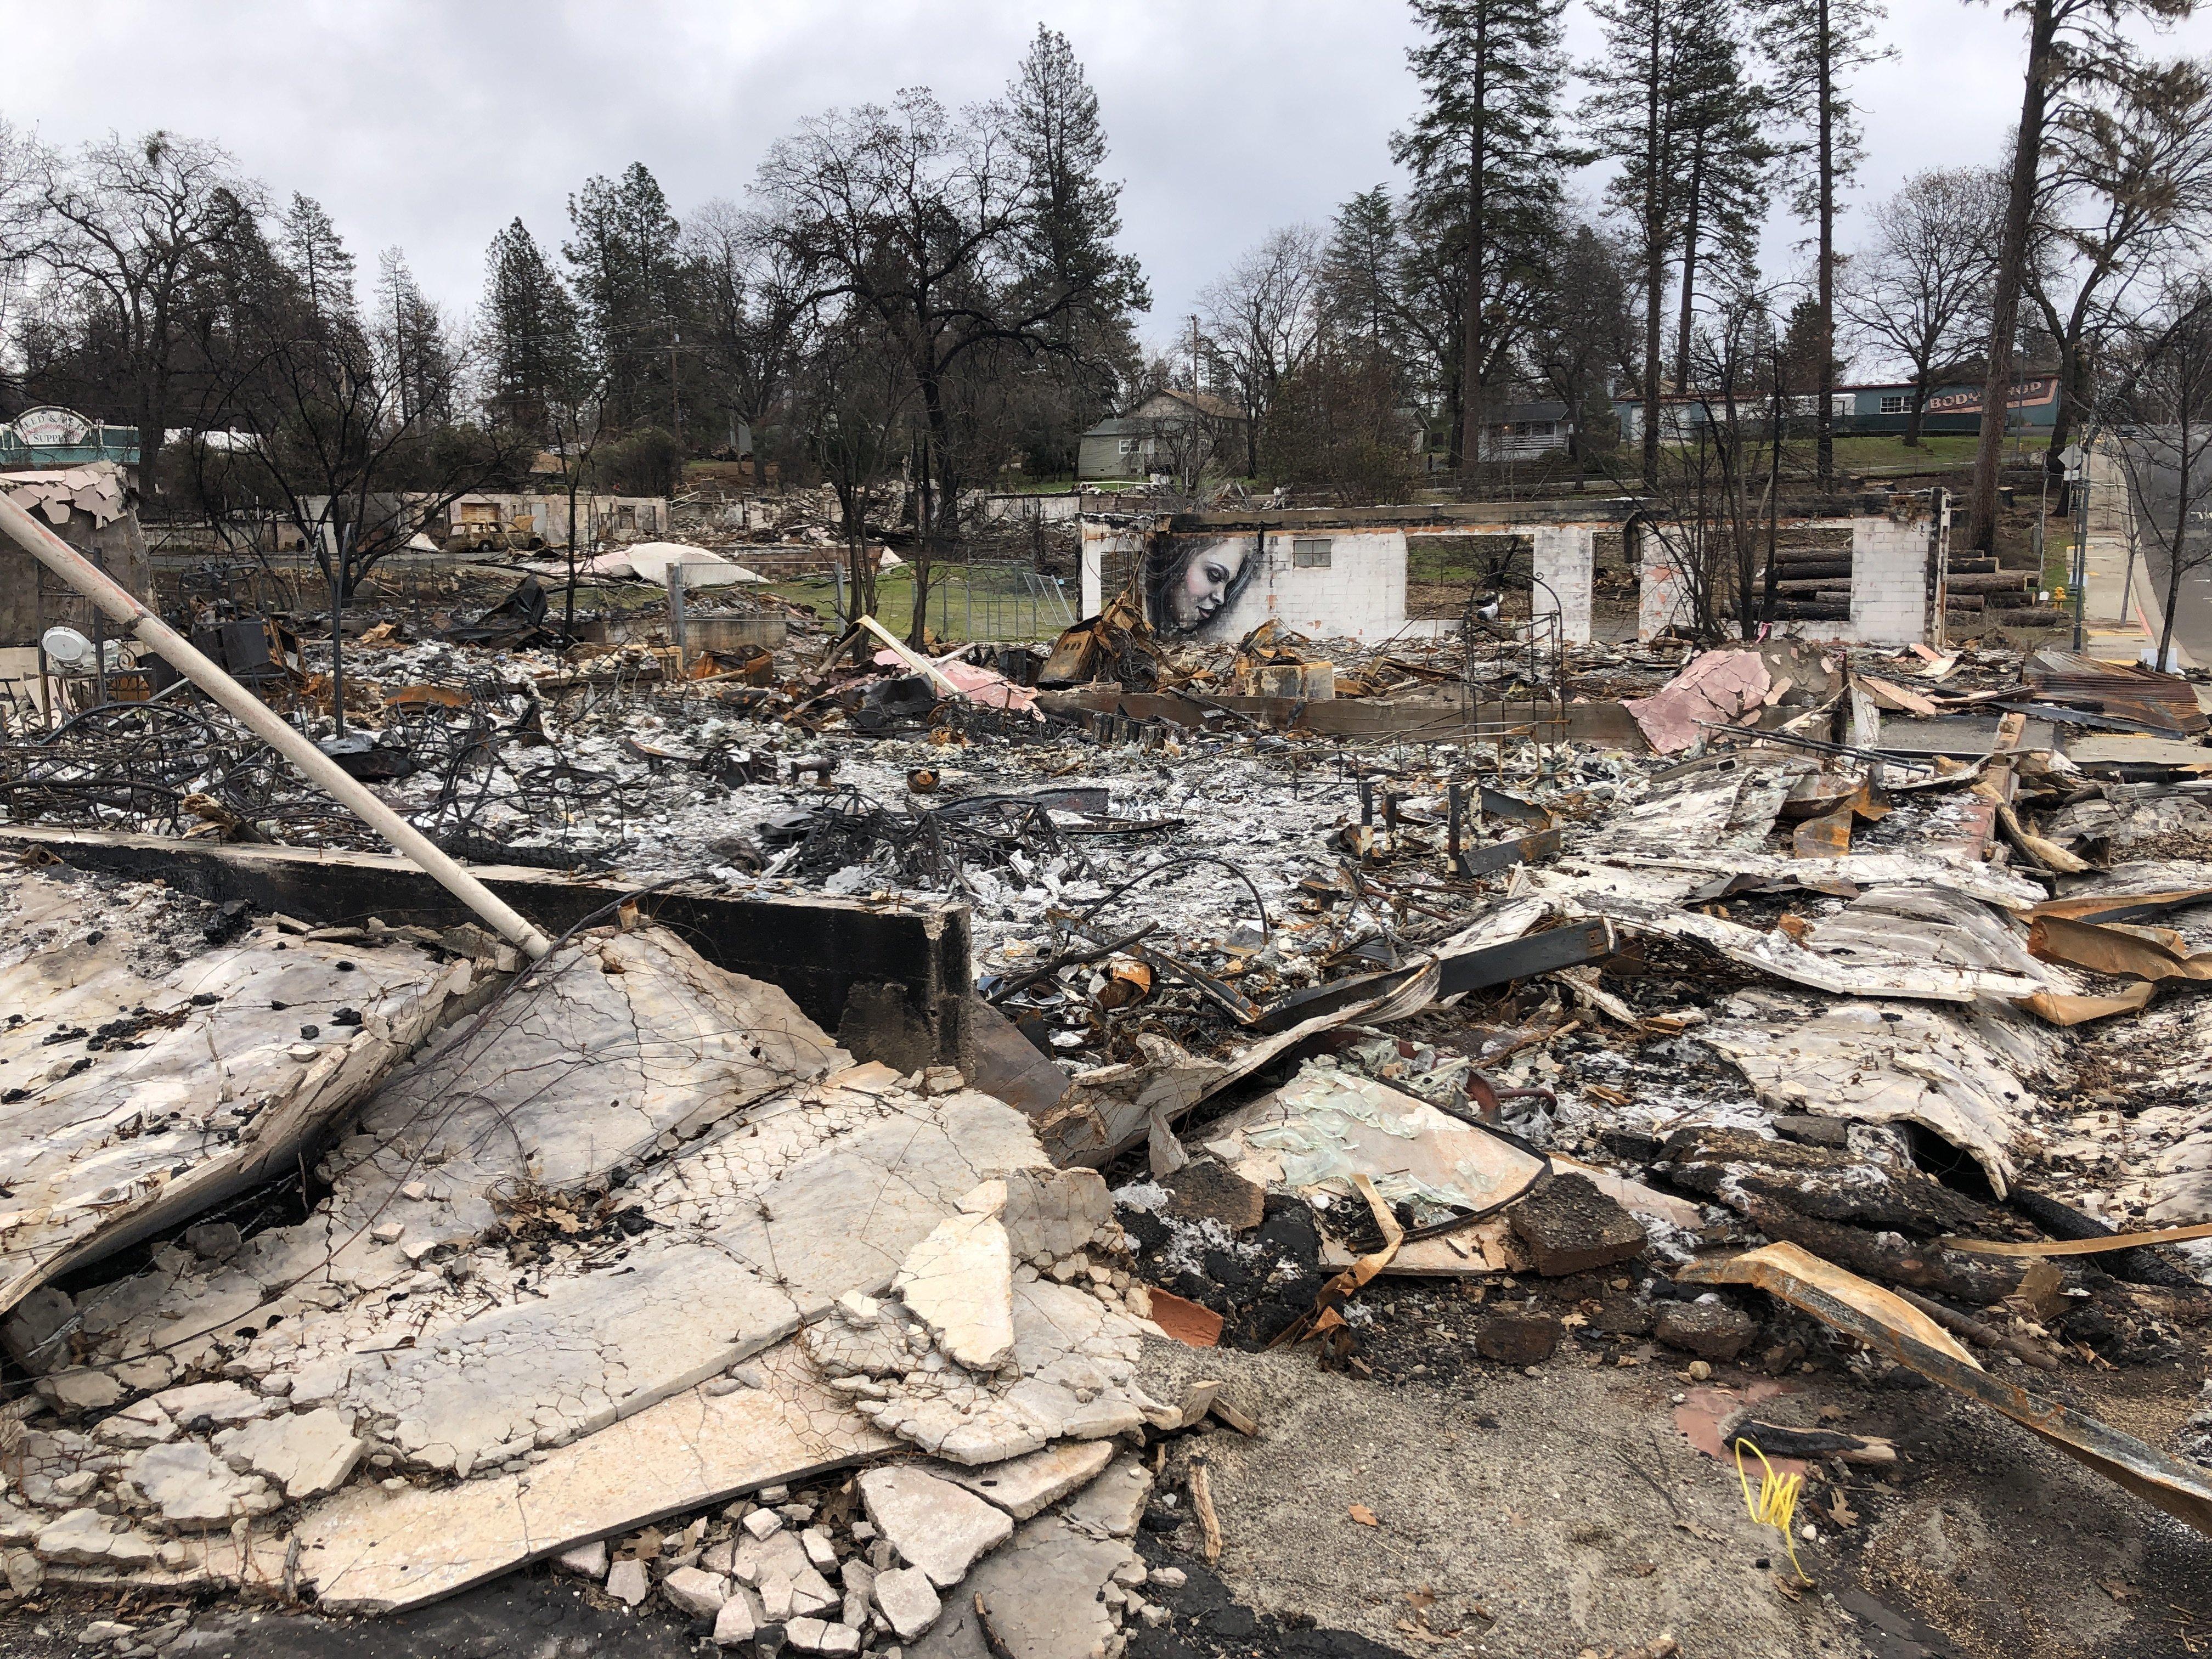 Burned buildings off the main road in Paradise. — Feb. 12